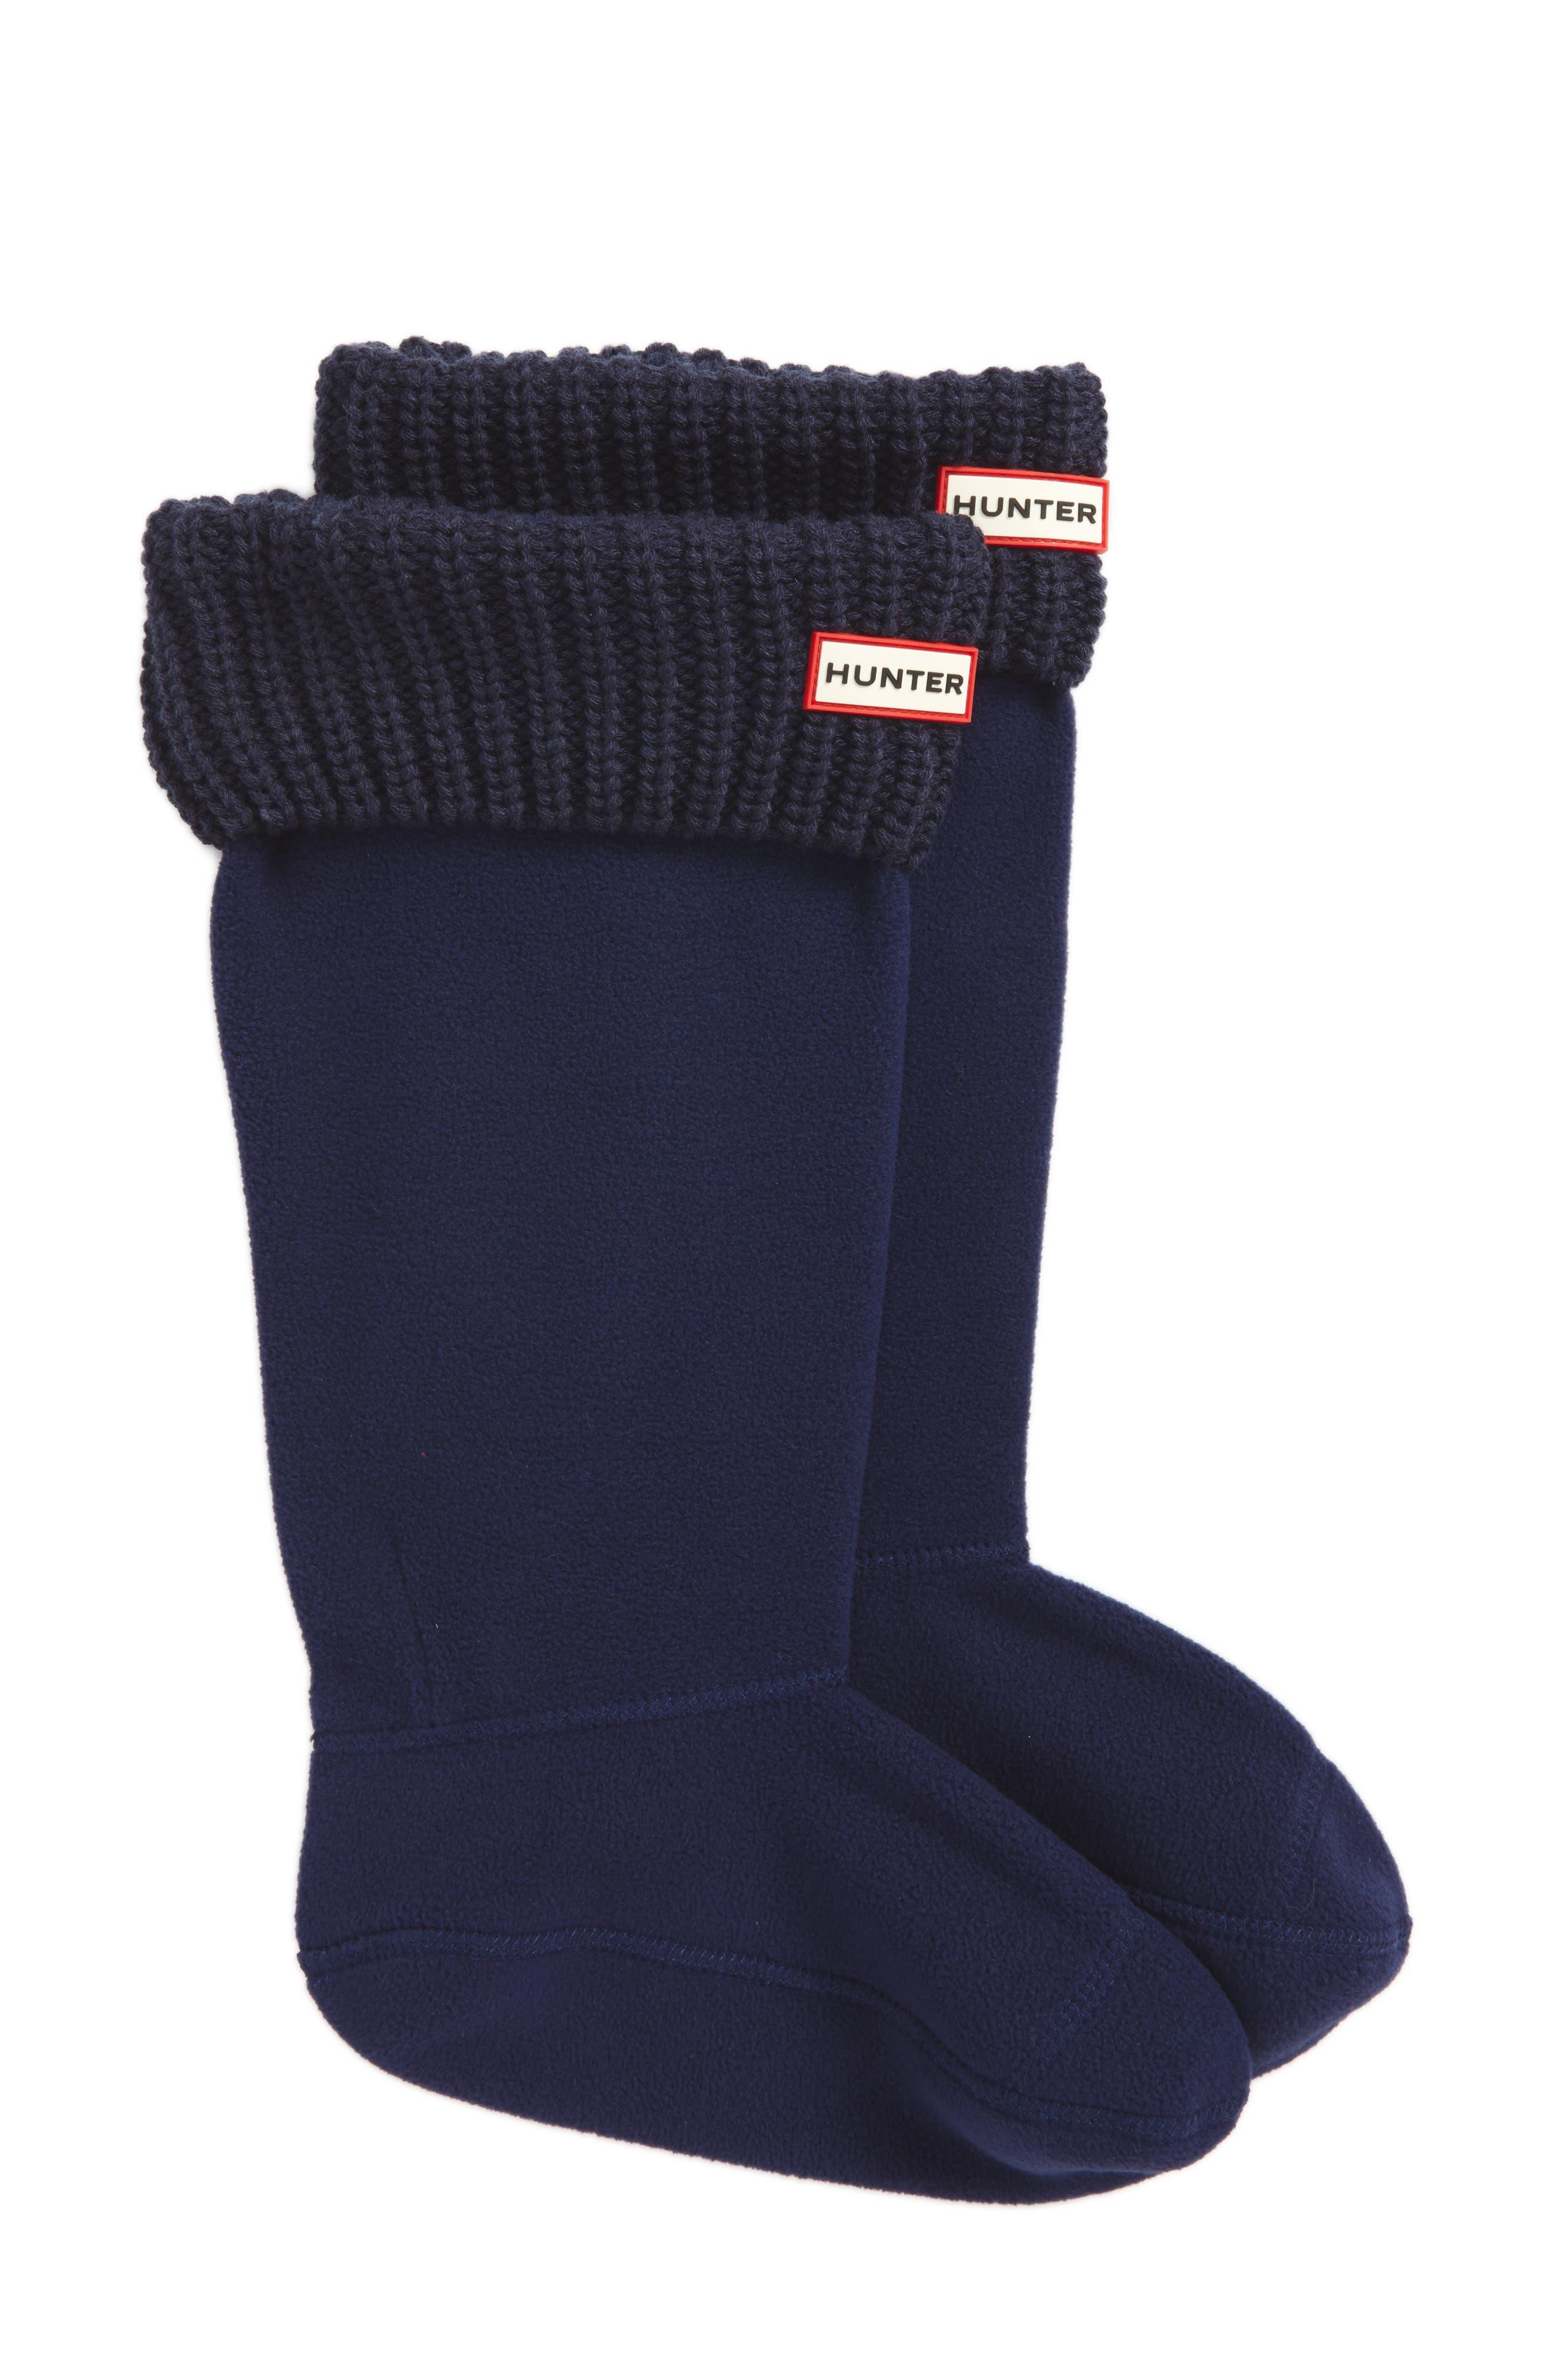 Tall Cardigan Knit Cuff Welly Boot Socks,                         Main,                         color, 400